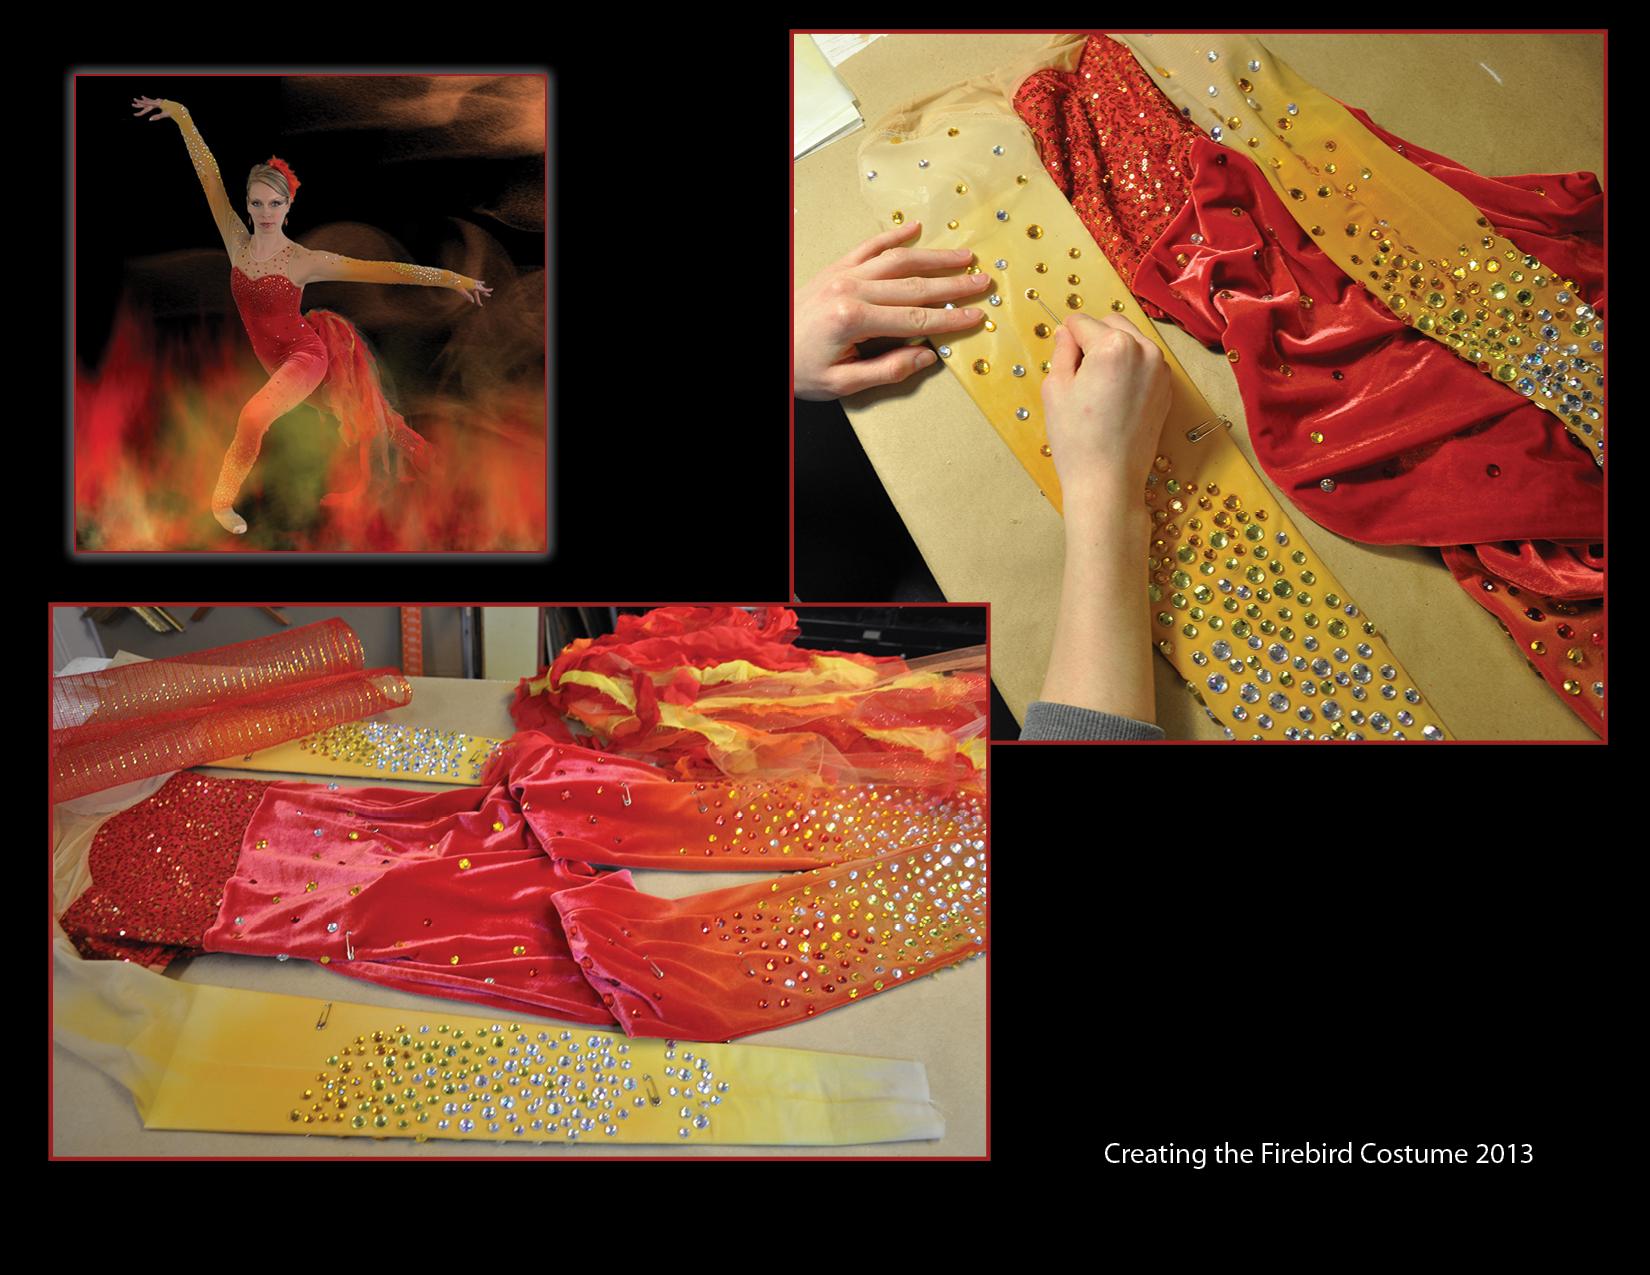 Firebird costume collage